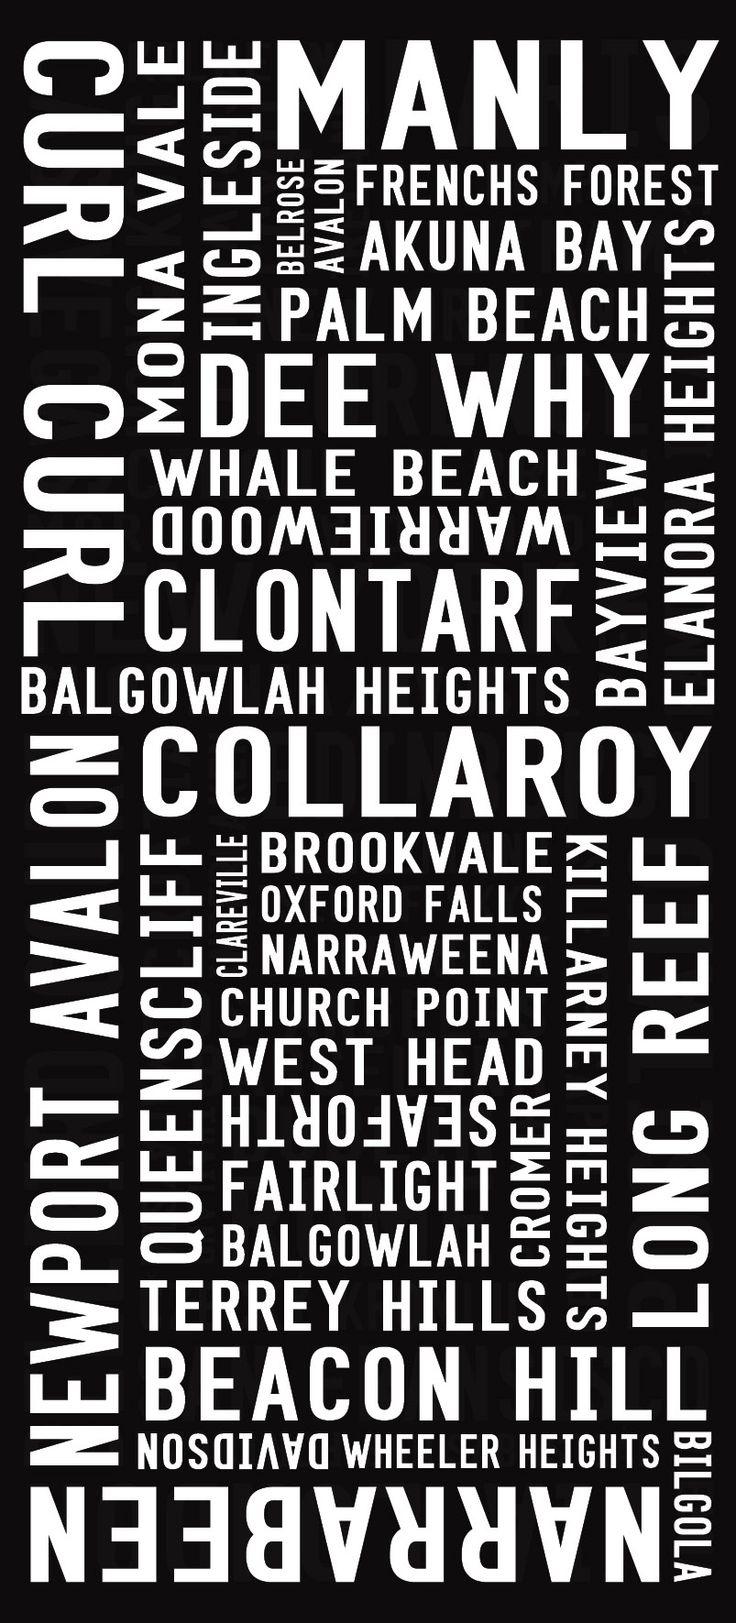 Sydney tram scrolls - Our current location